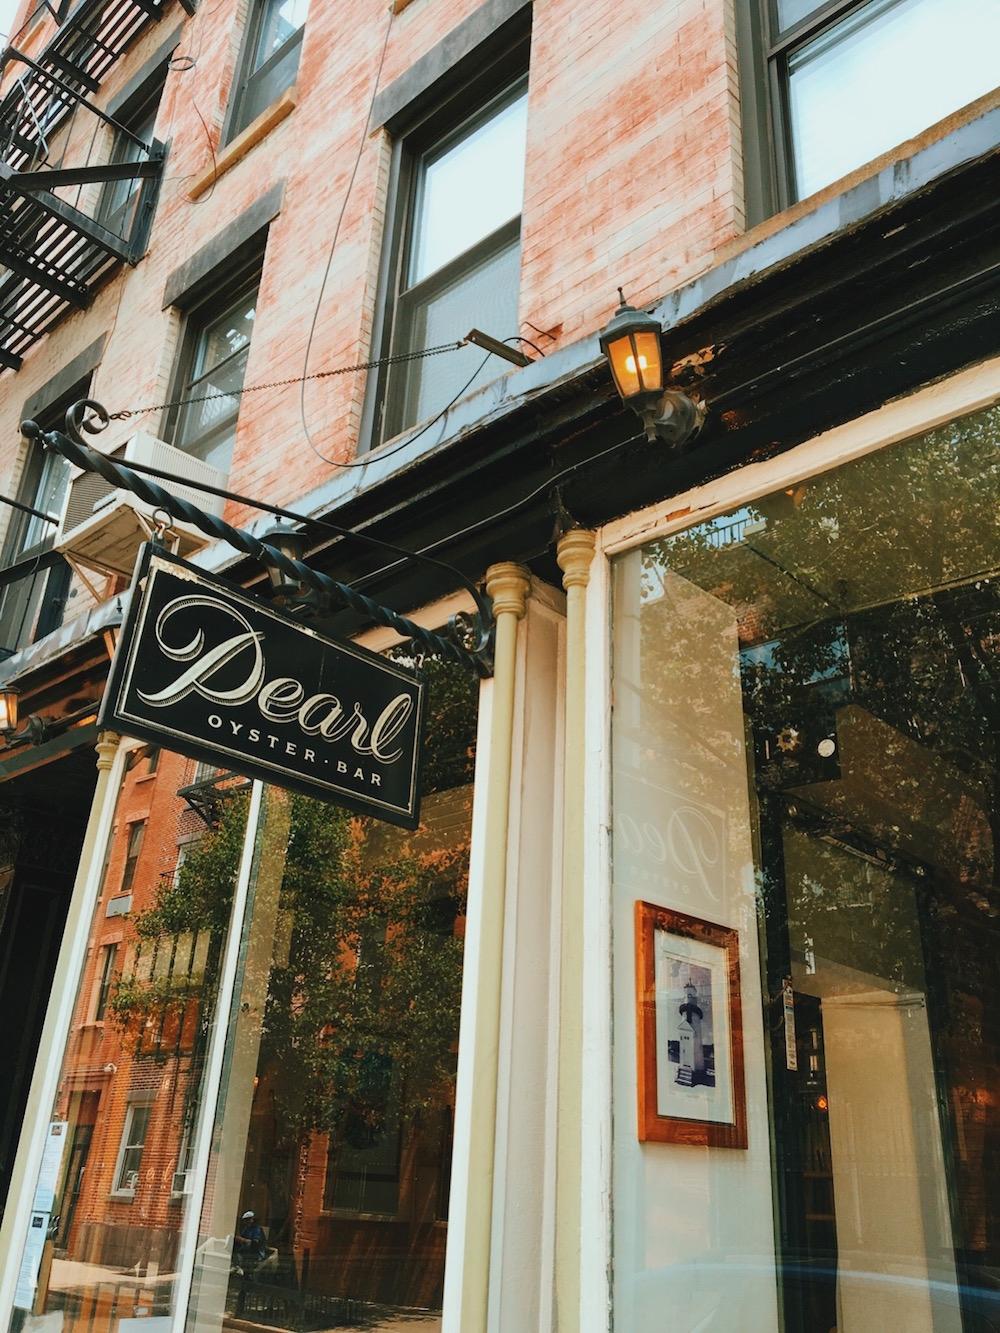 Pearl Oyster Bar Cornelia Street